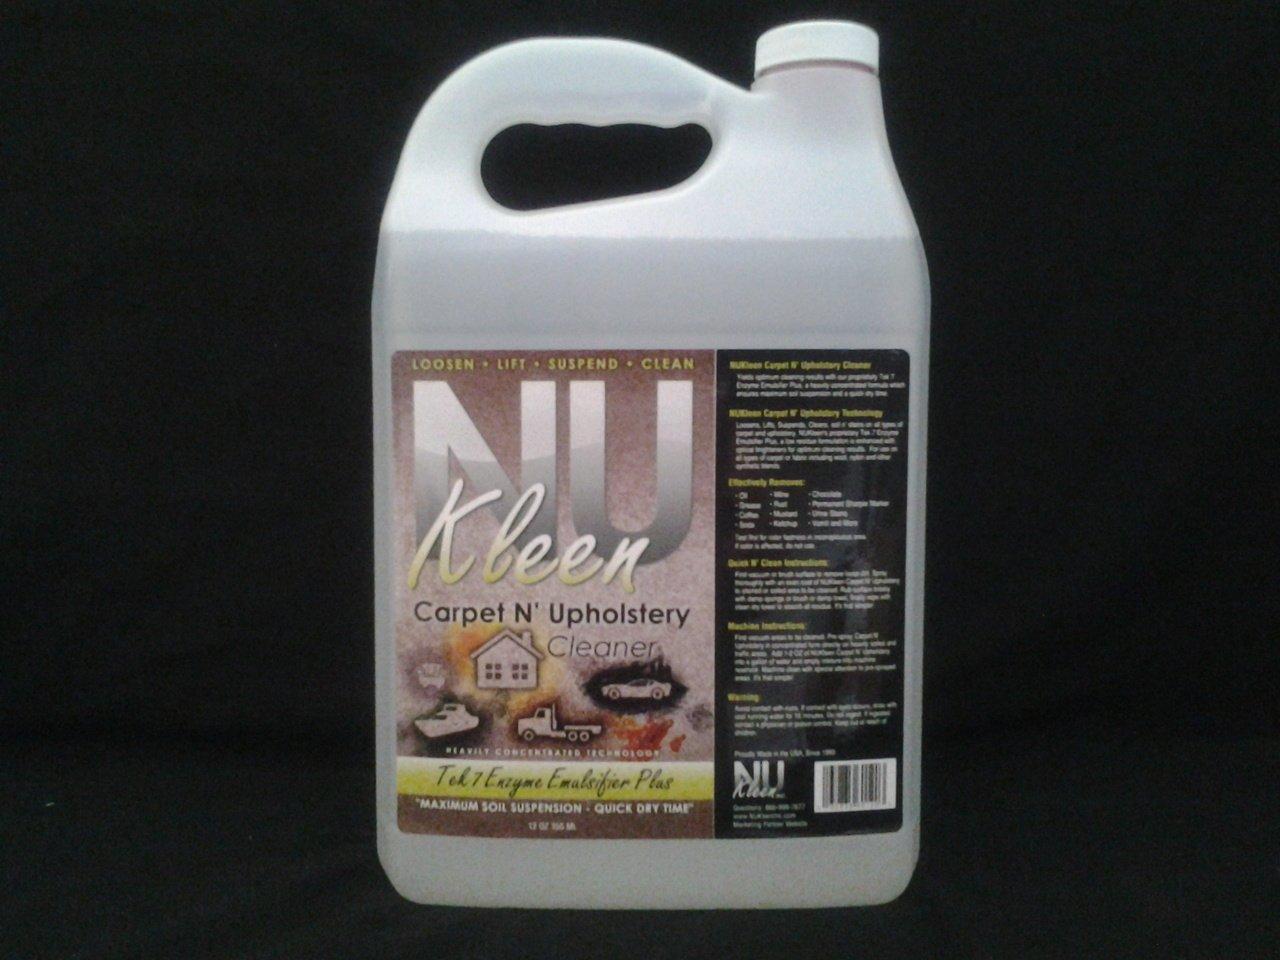 NuKleen Carpet N' Upholstery Cleaner - 128 oz.